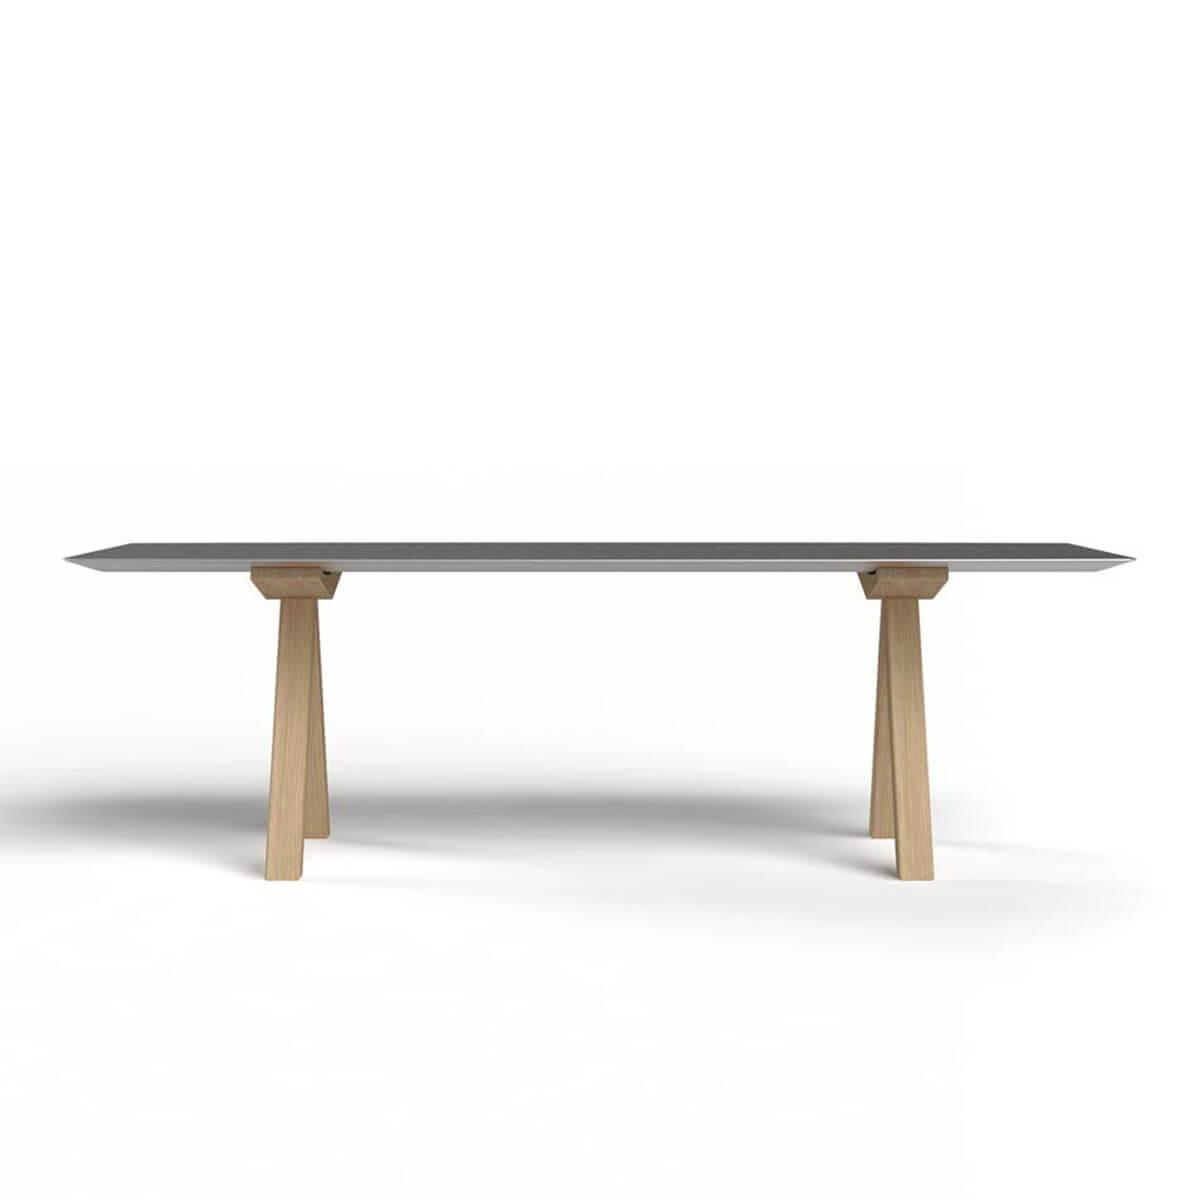 b.d barcelona design  Table B - Wood 办公桌